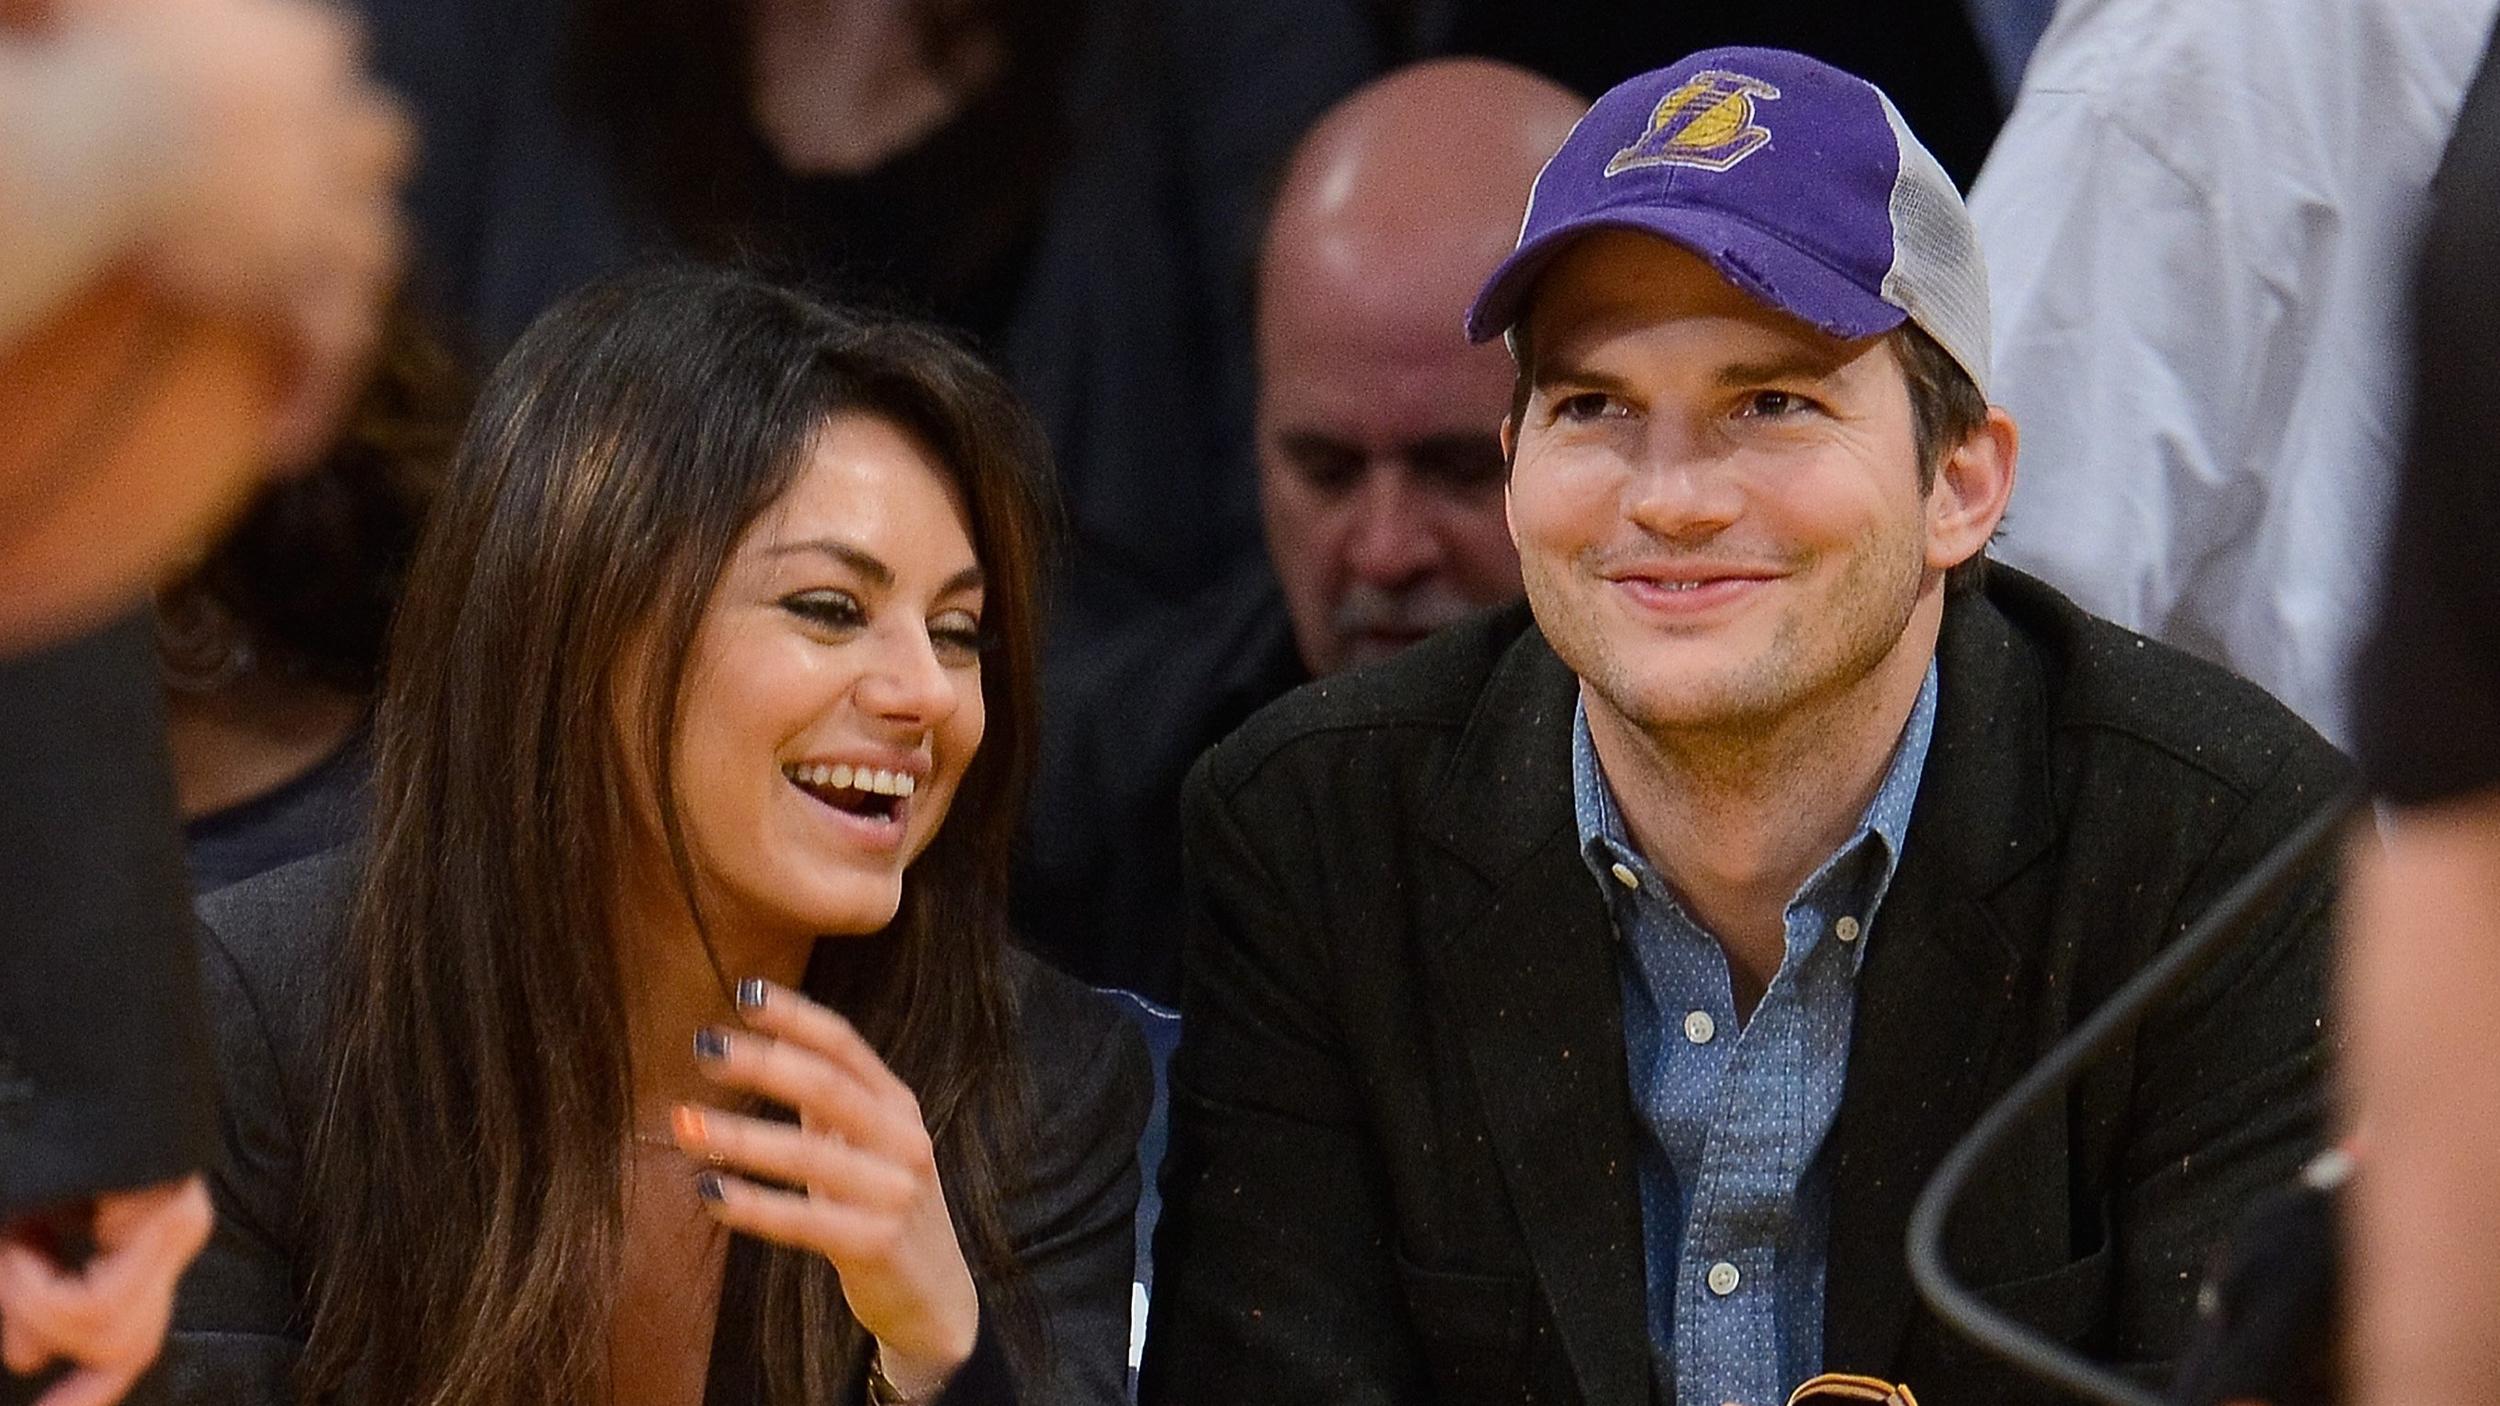 Ashton Kutcher reveals how baby Wyatt got her name - TODAY.com